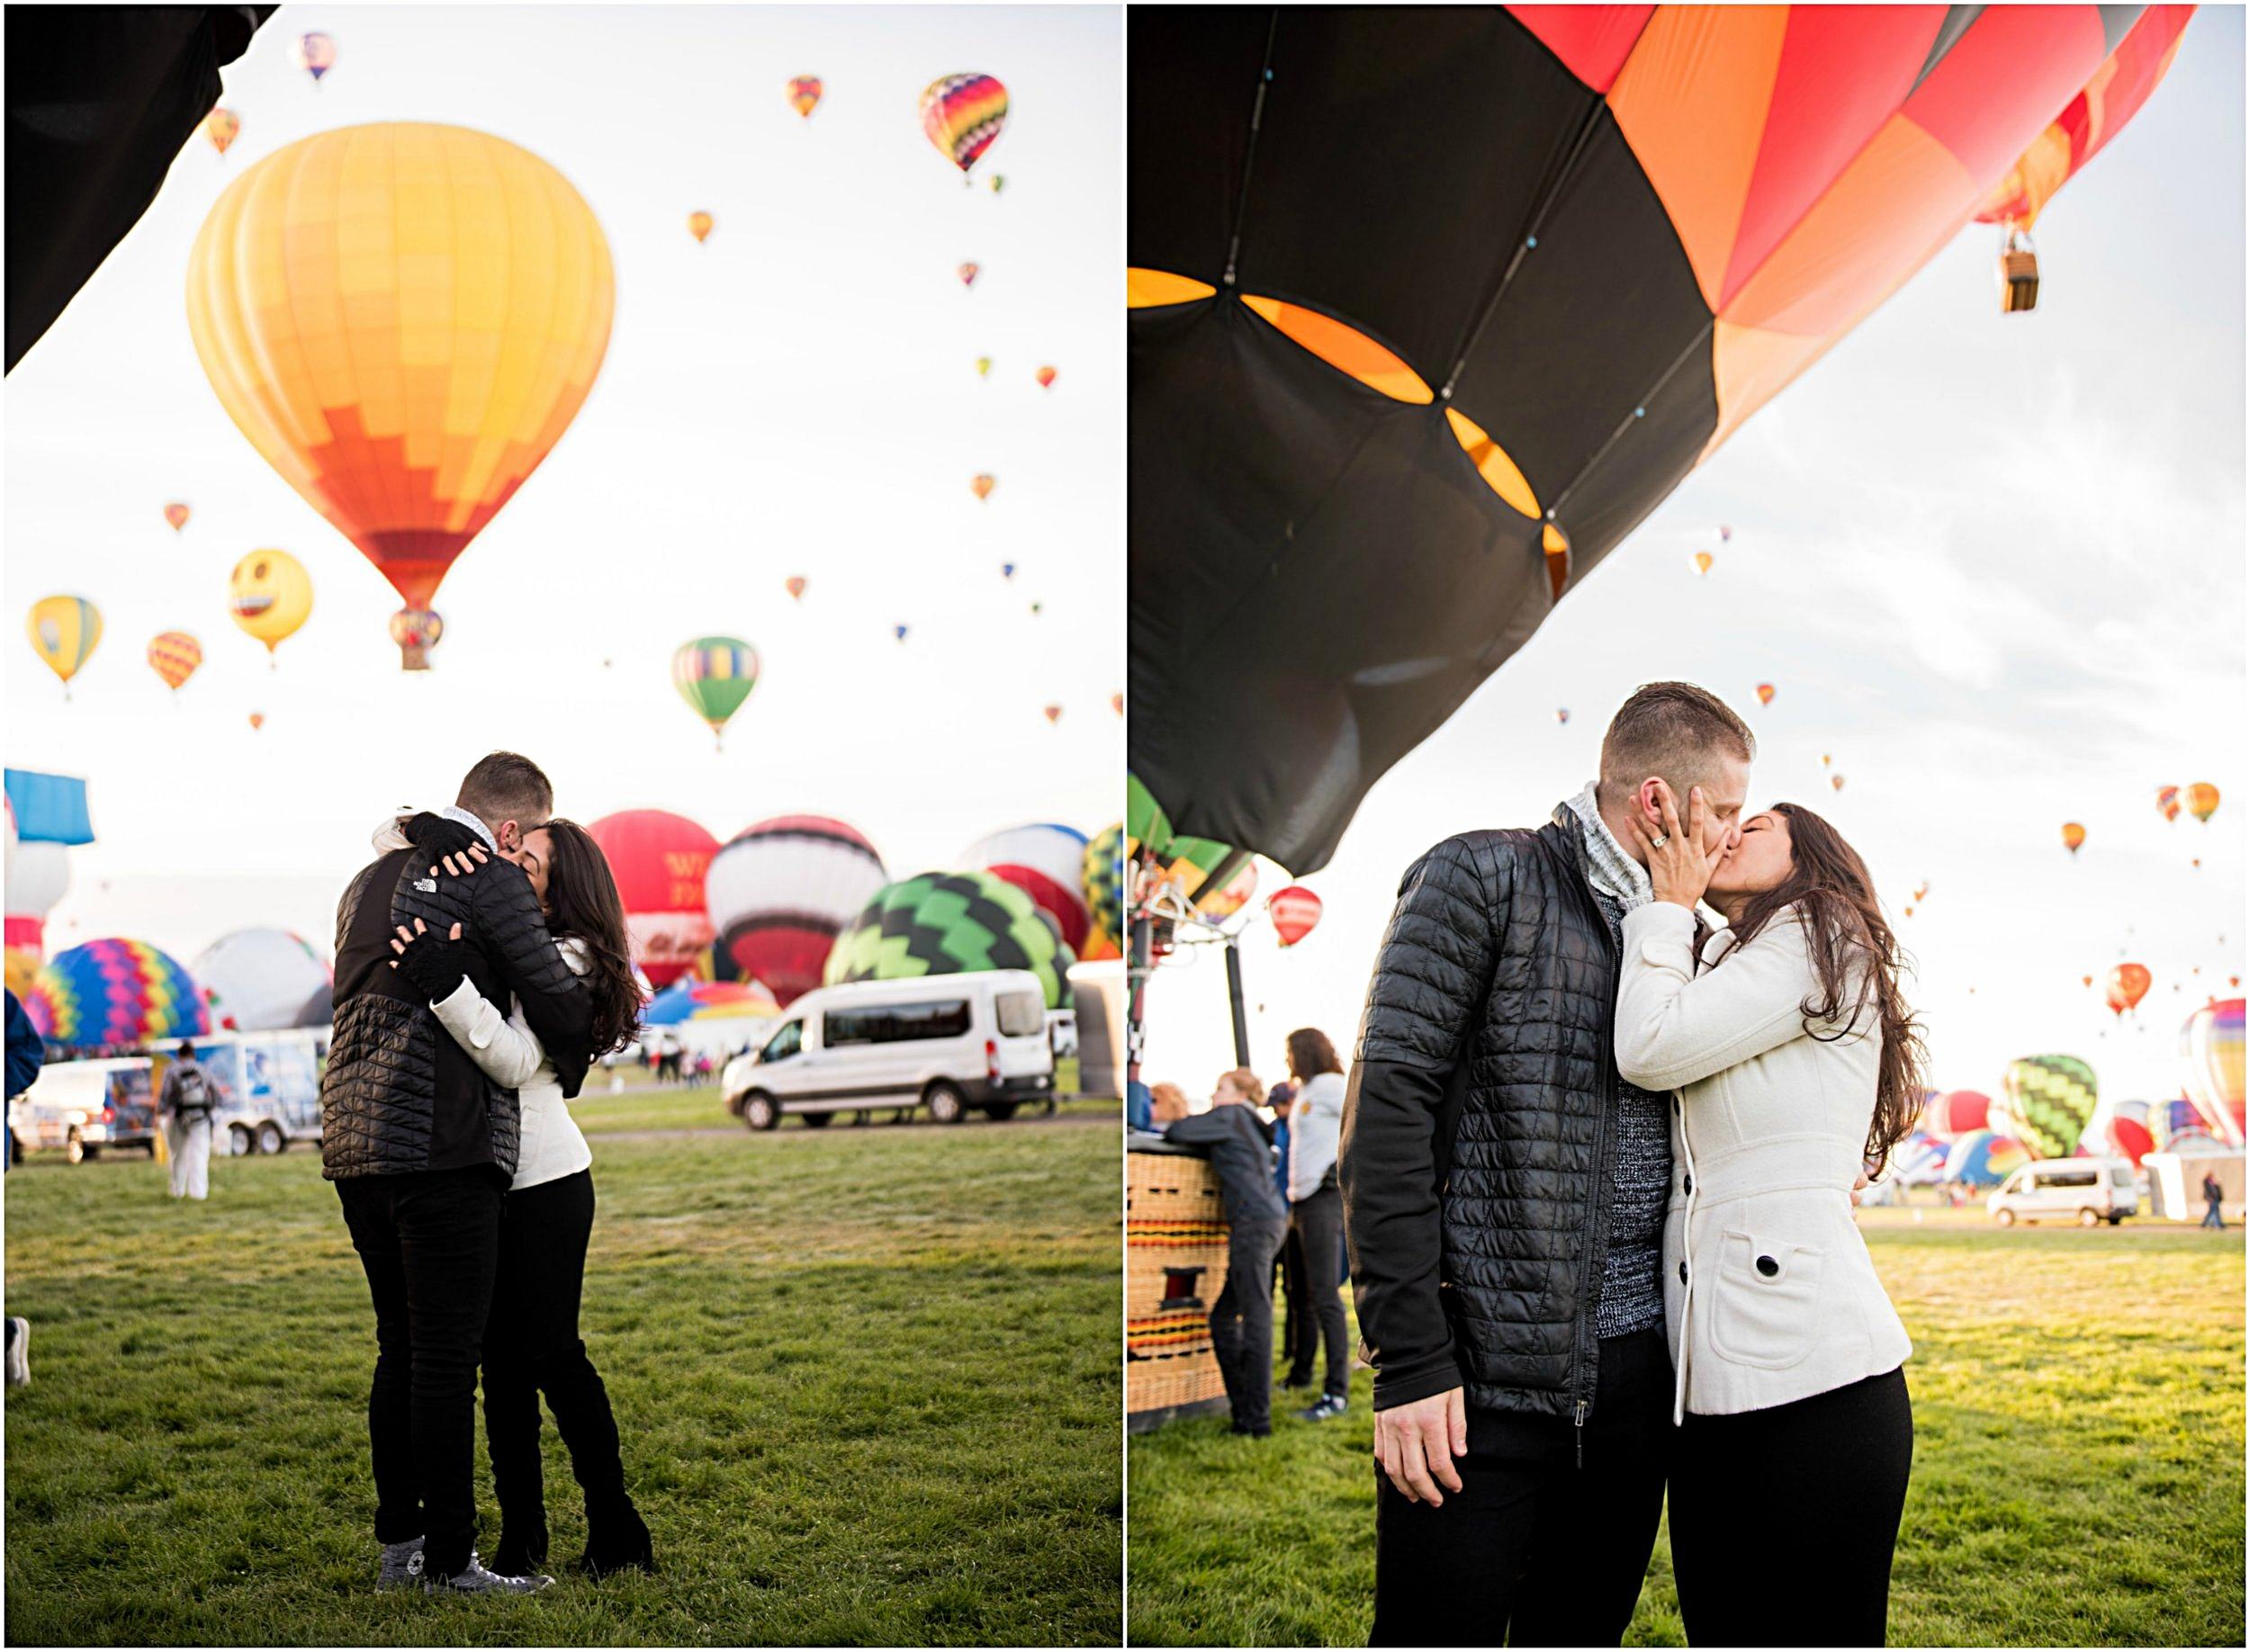 balloon fiesta proposal photography